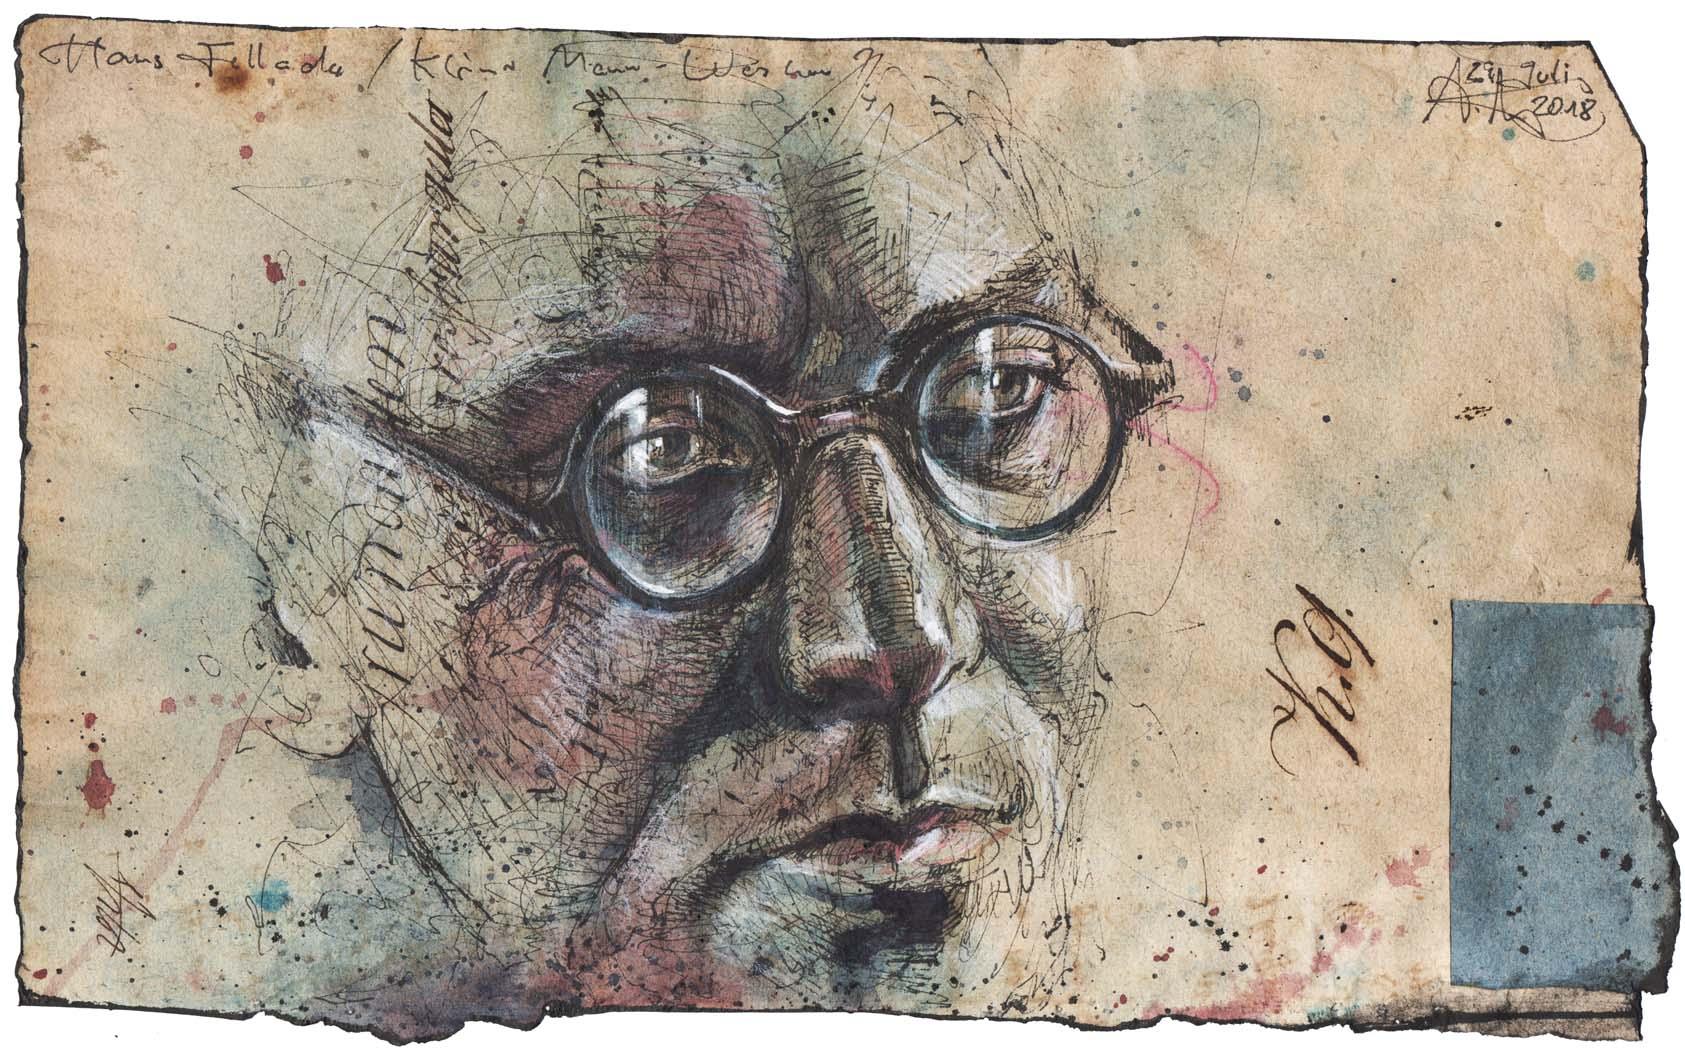 Hans Fallada | Klener Mann - Was nun?